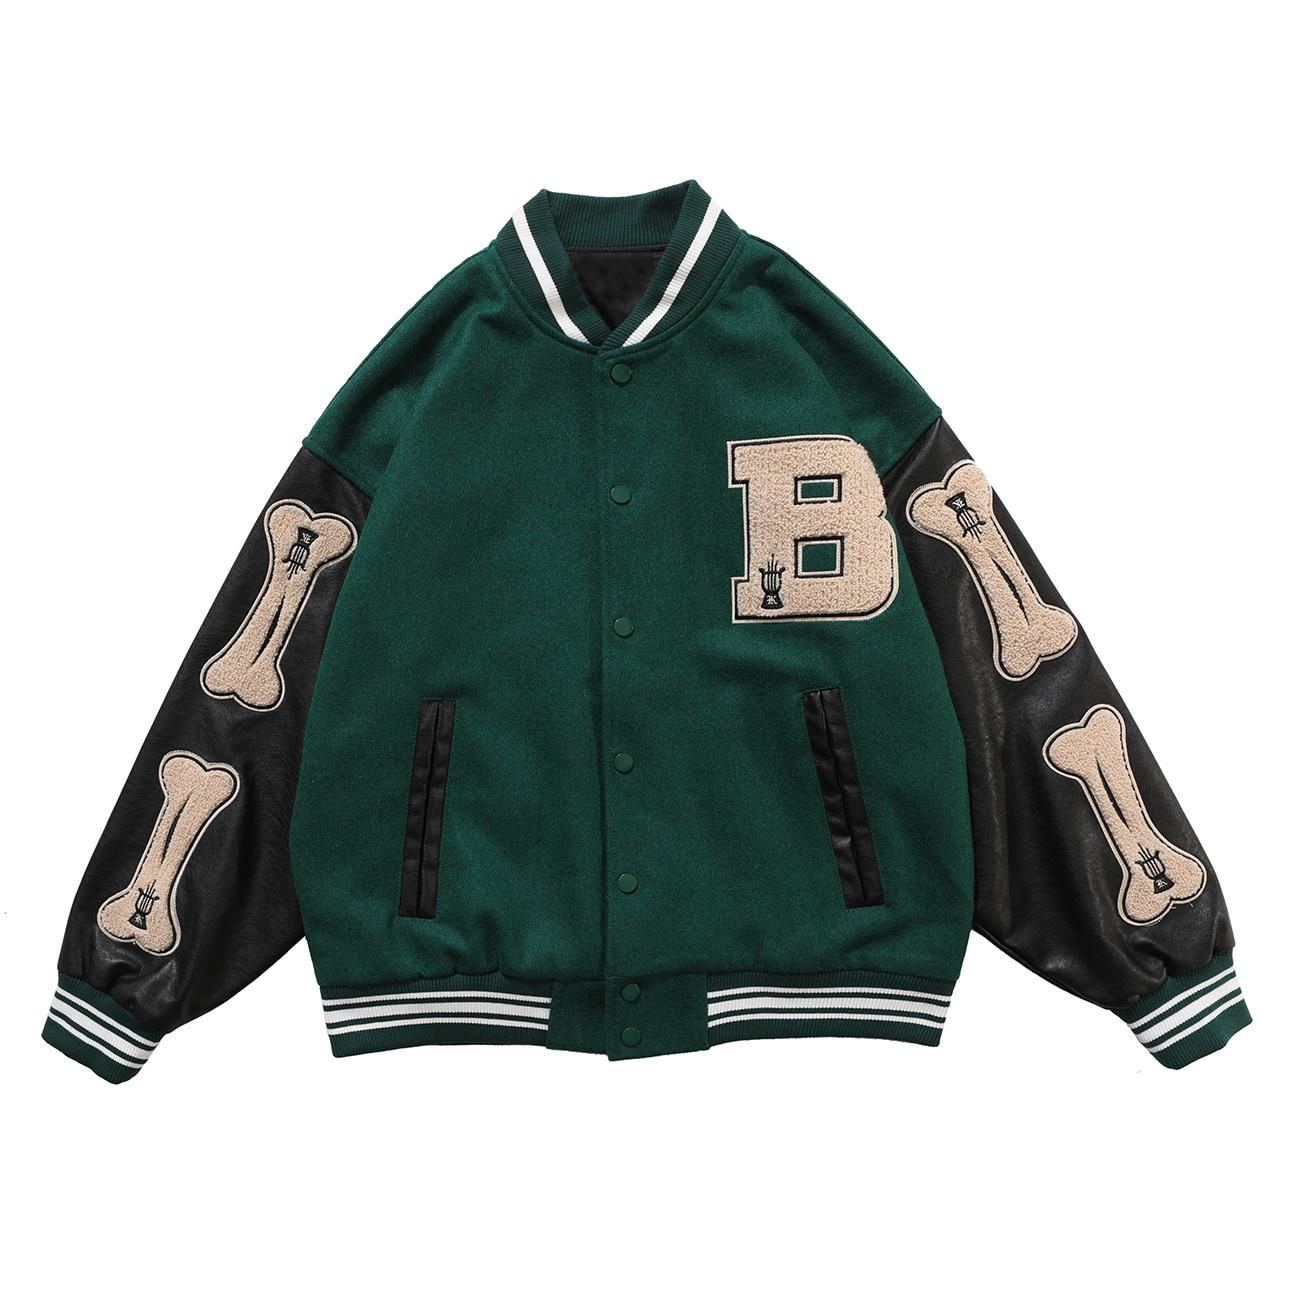 LACIBLE 2020SS Hip Hop Furry Bone Patchwork Color Block Jackets Mens Harajuku Streetwear Bomber Jack